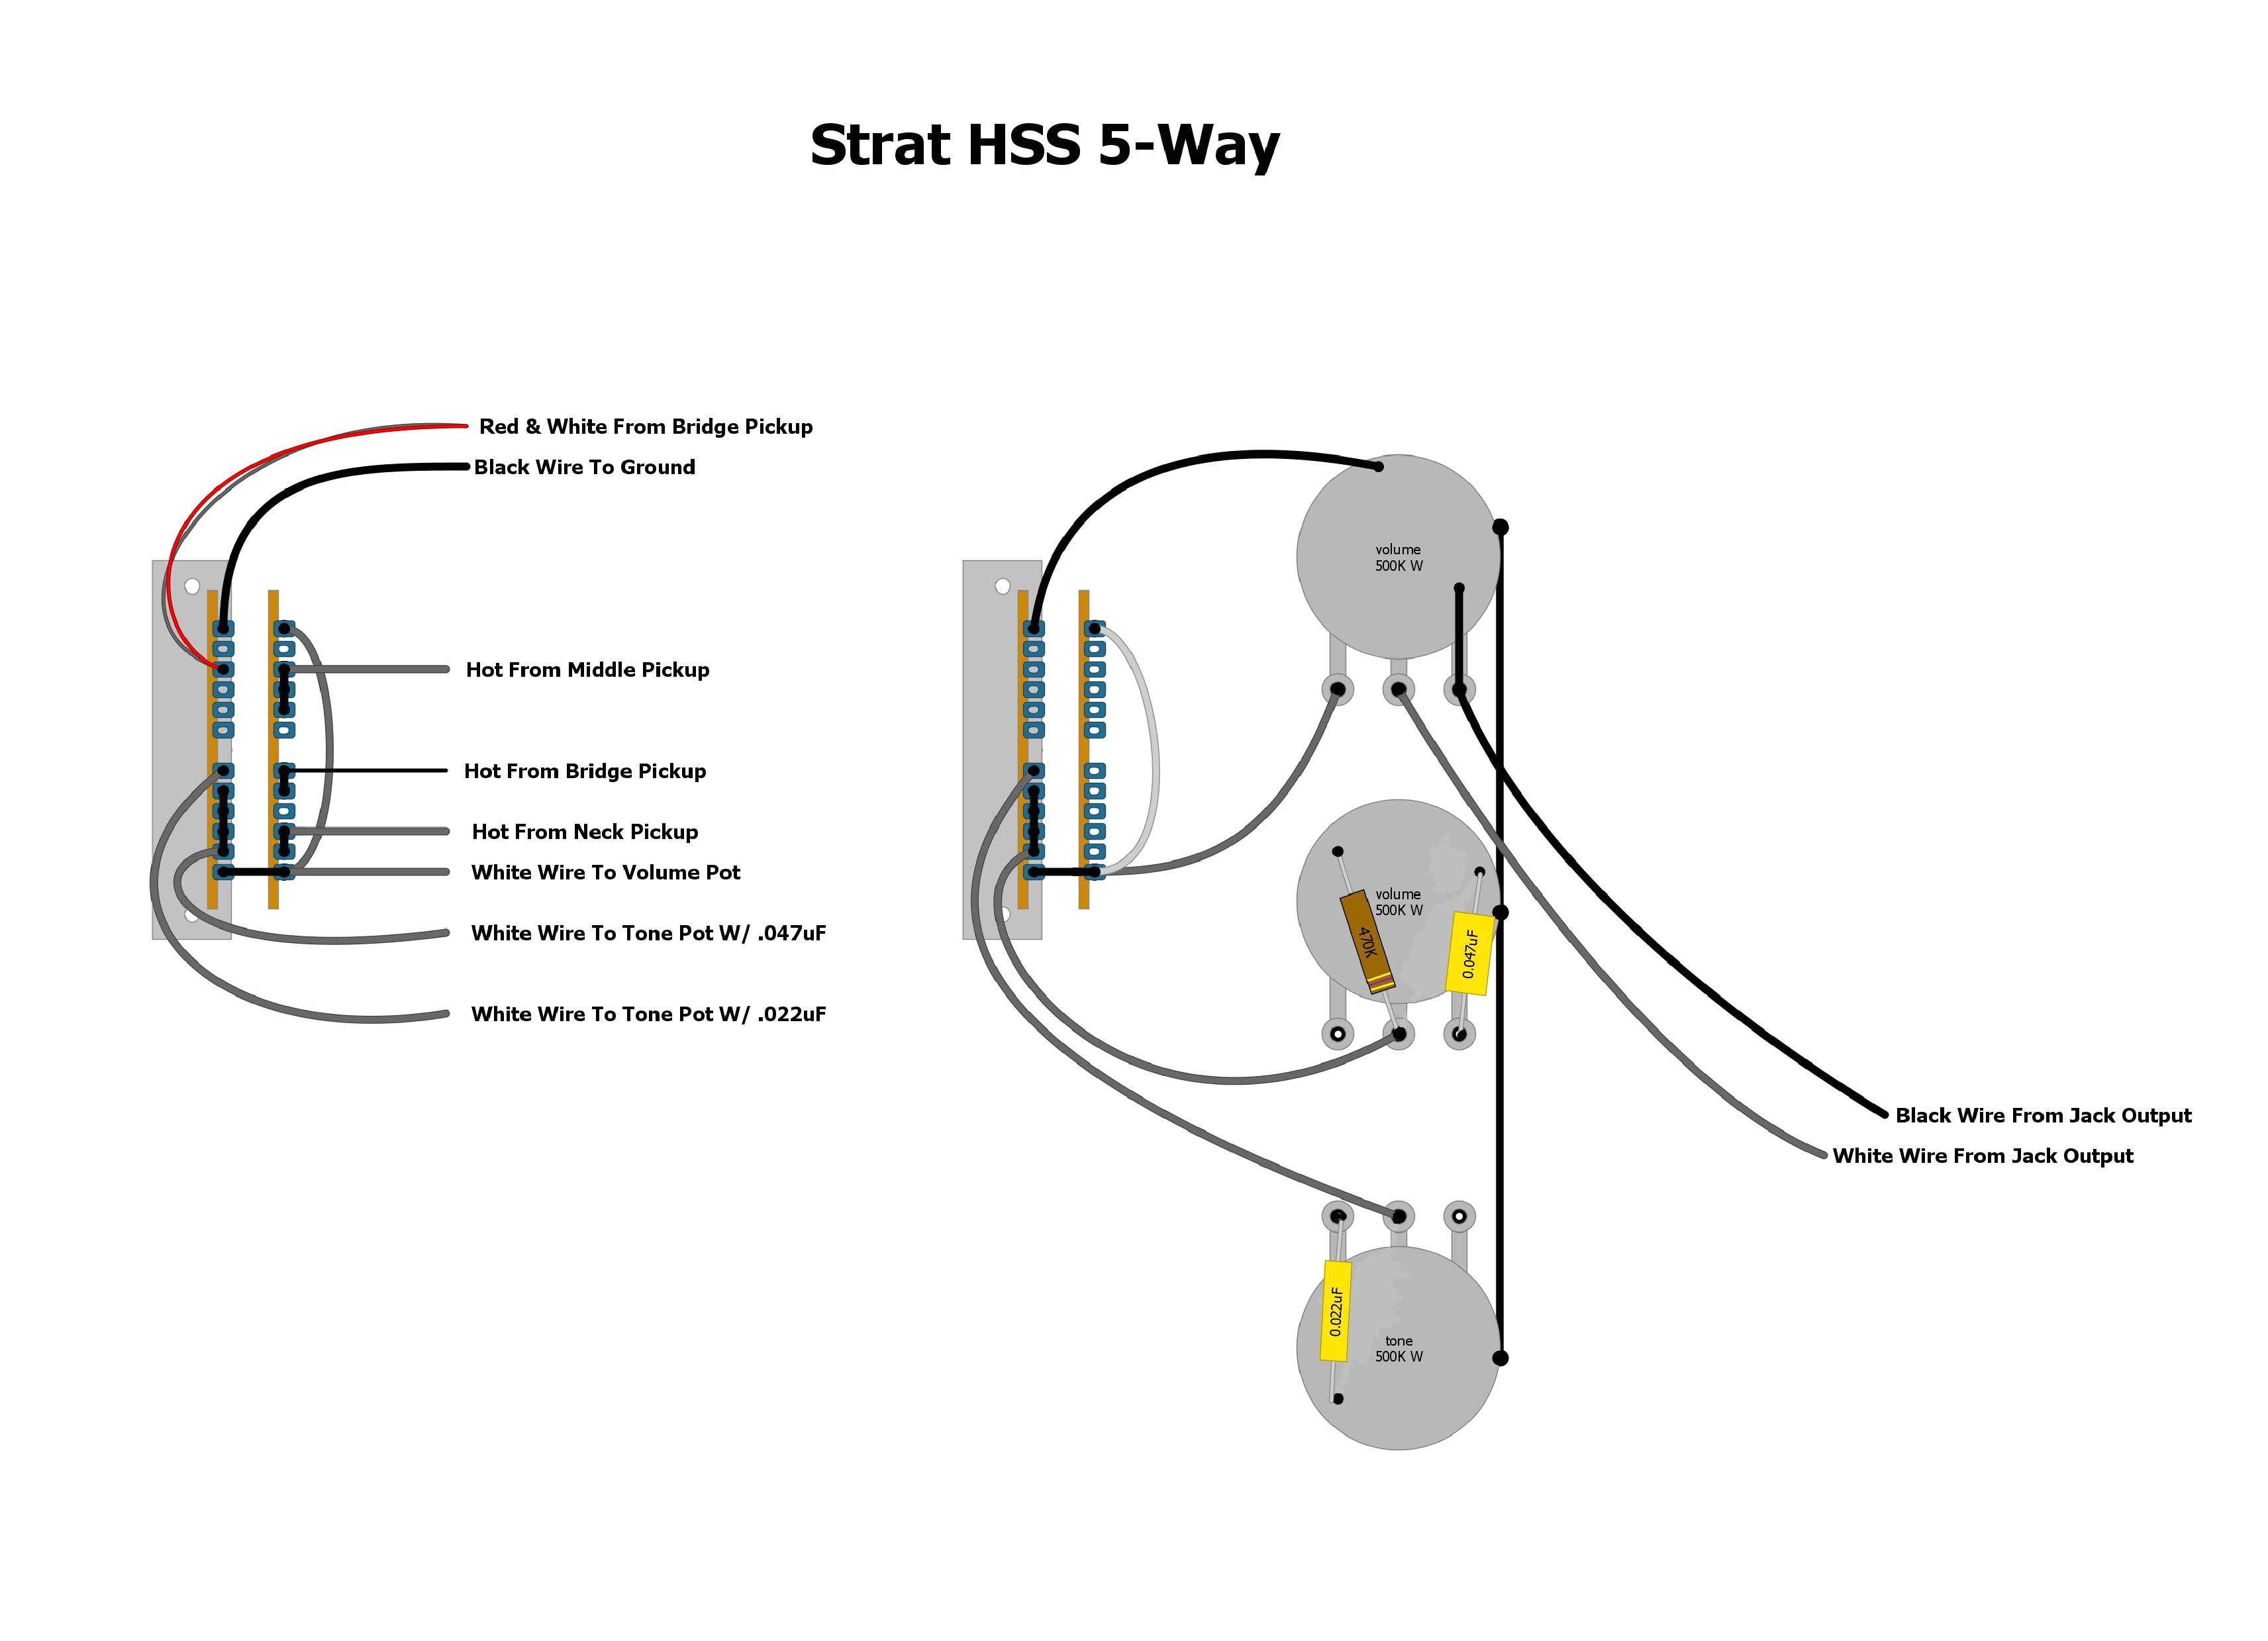 fender telecaster deluxe wiring diagram simplified shapes wiring diagram for a telecaster guitar new wiring diagram of fender telecaster deluxe wiring diagram jpg